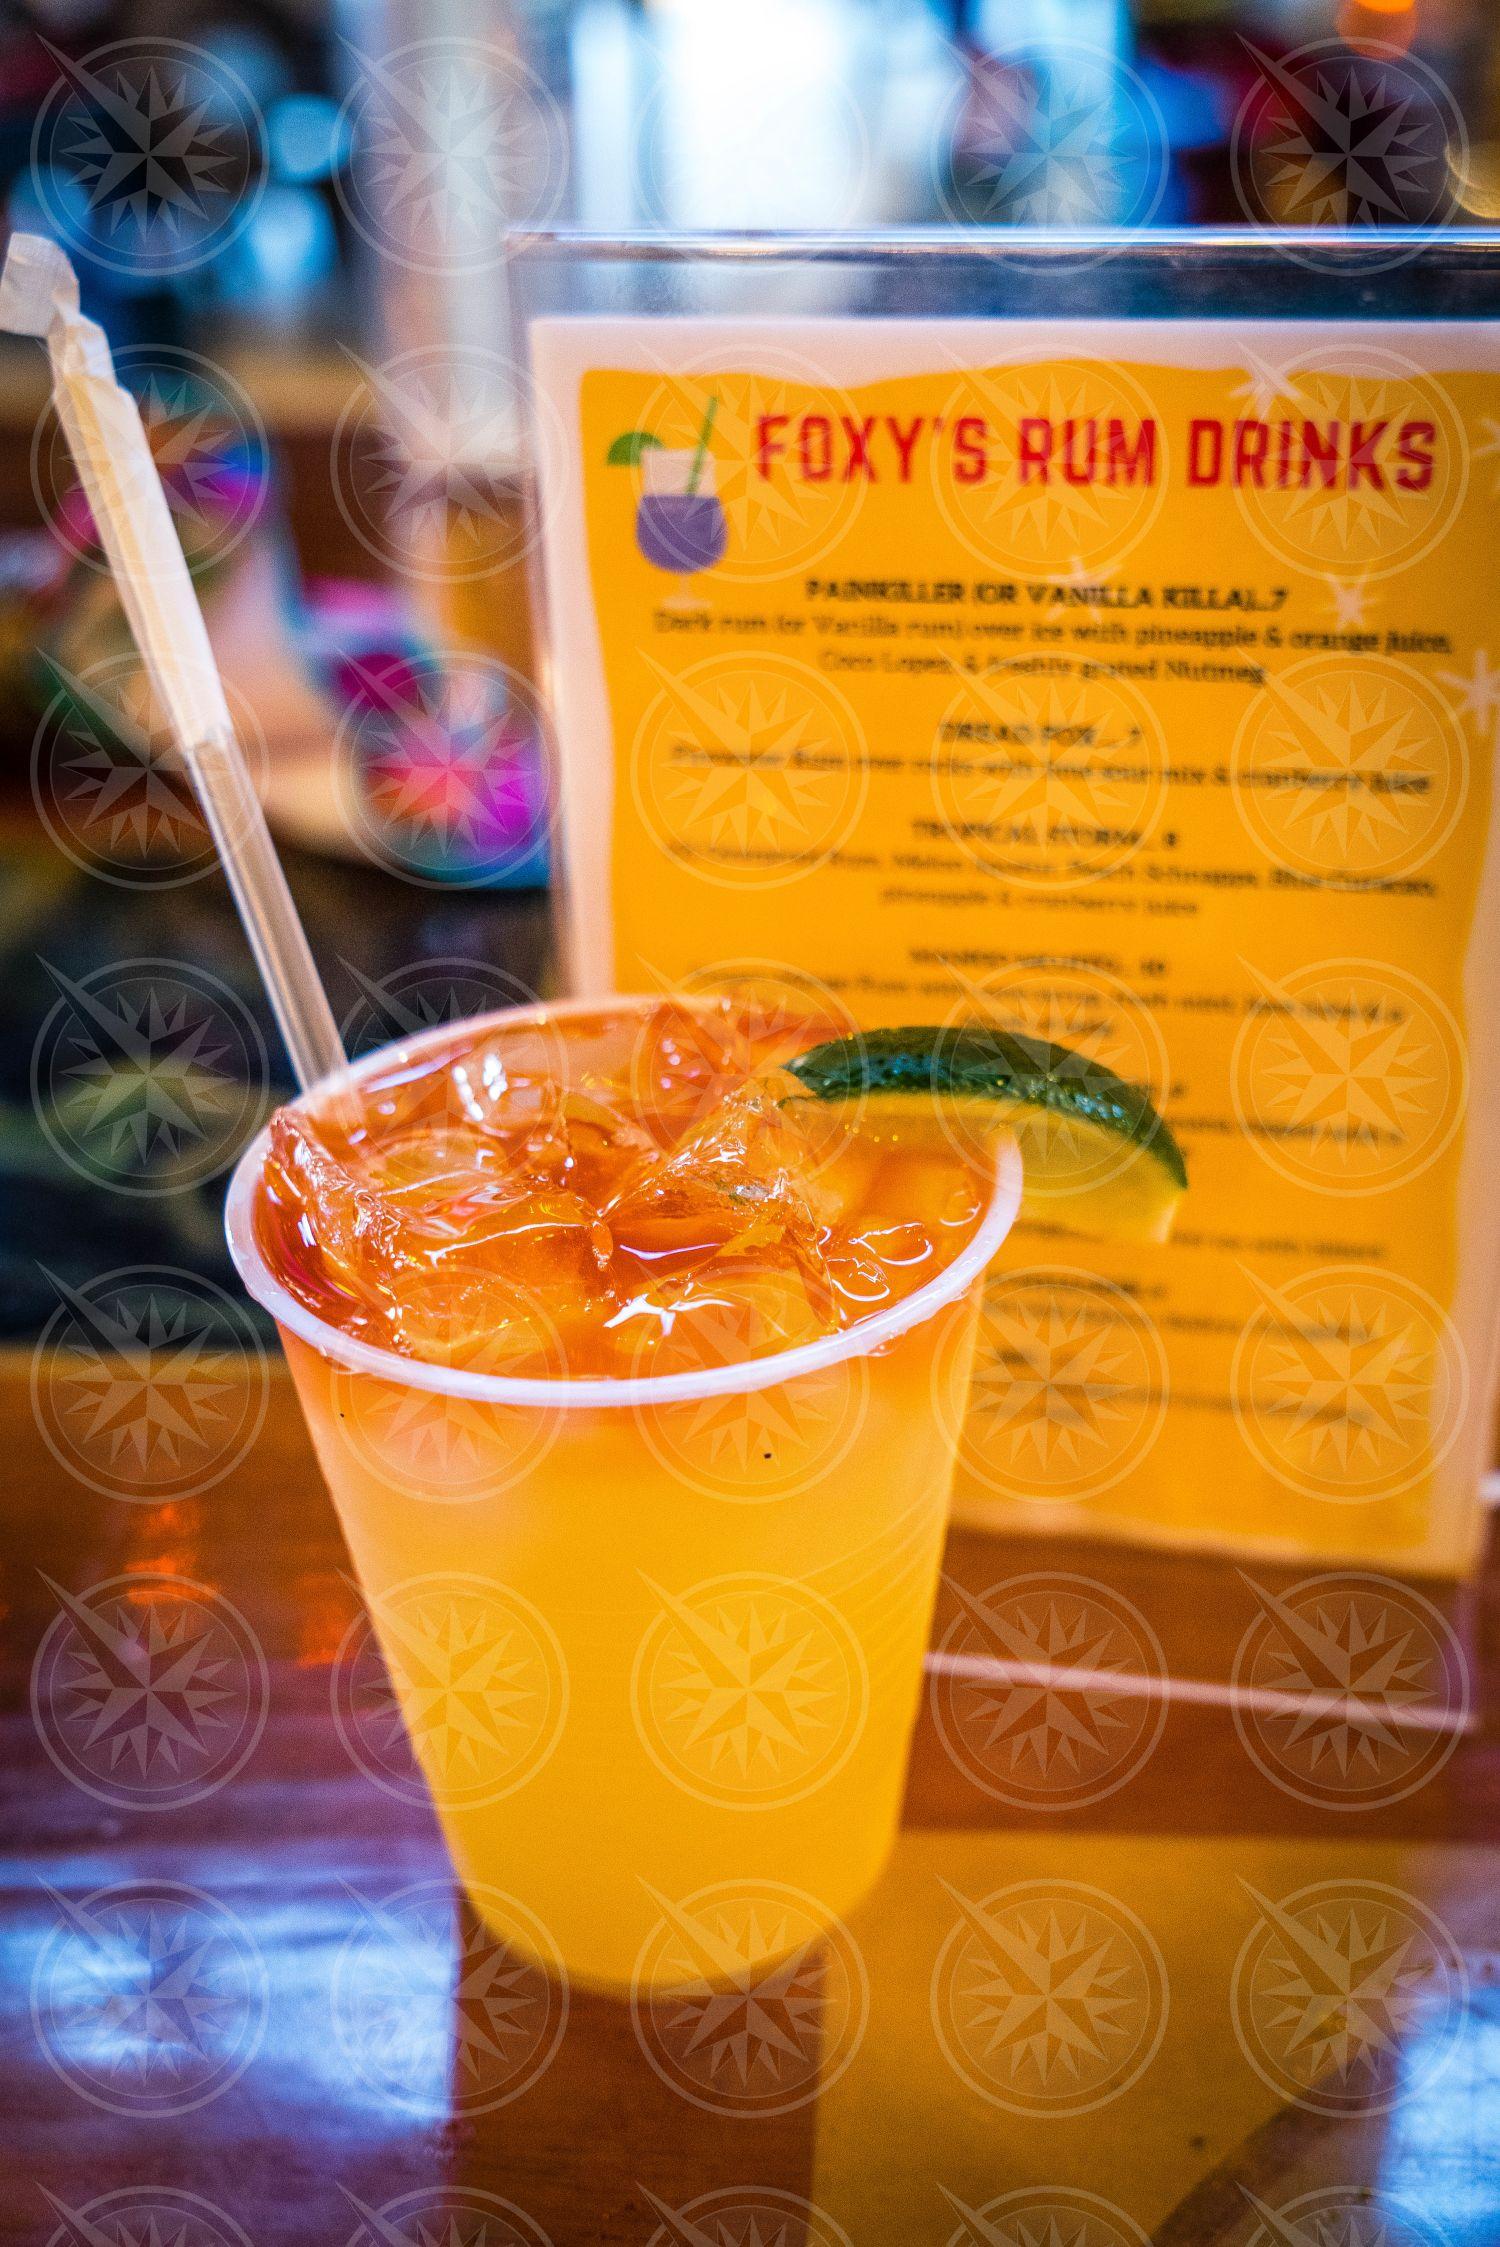 Foxy's Rum Drink at Foxy's Bar, Jost Van Dyke, British Virgin Islands